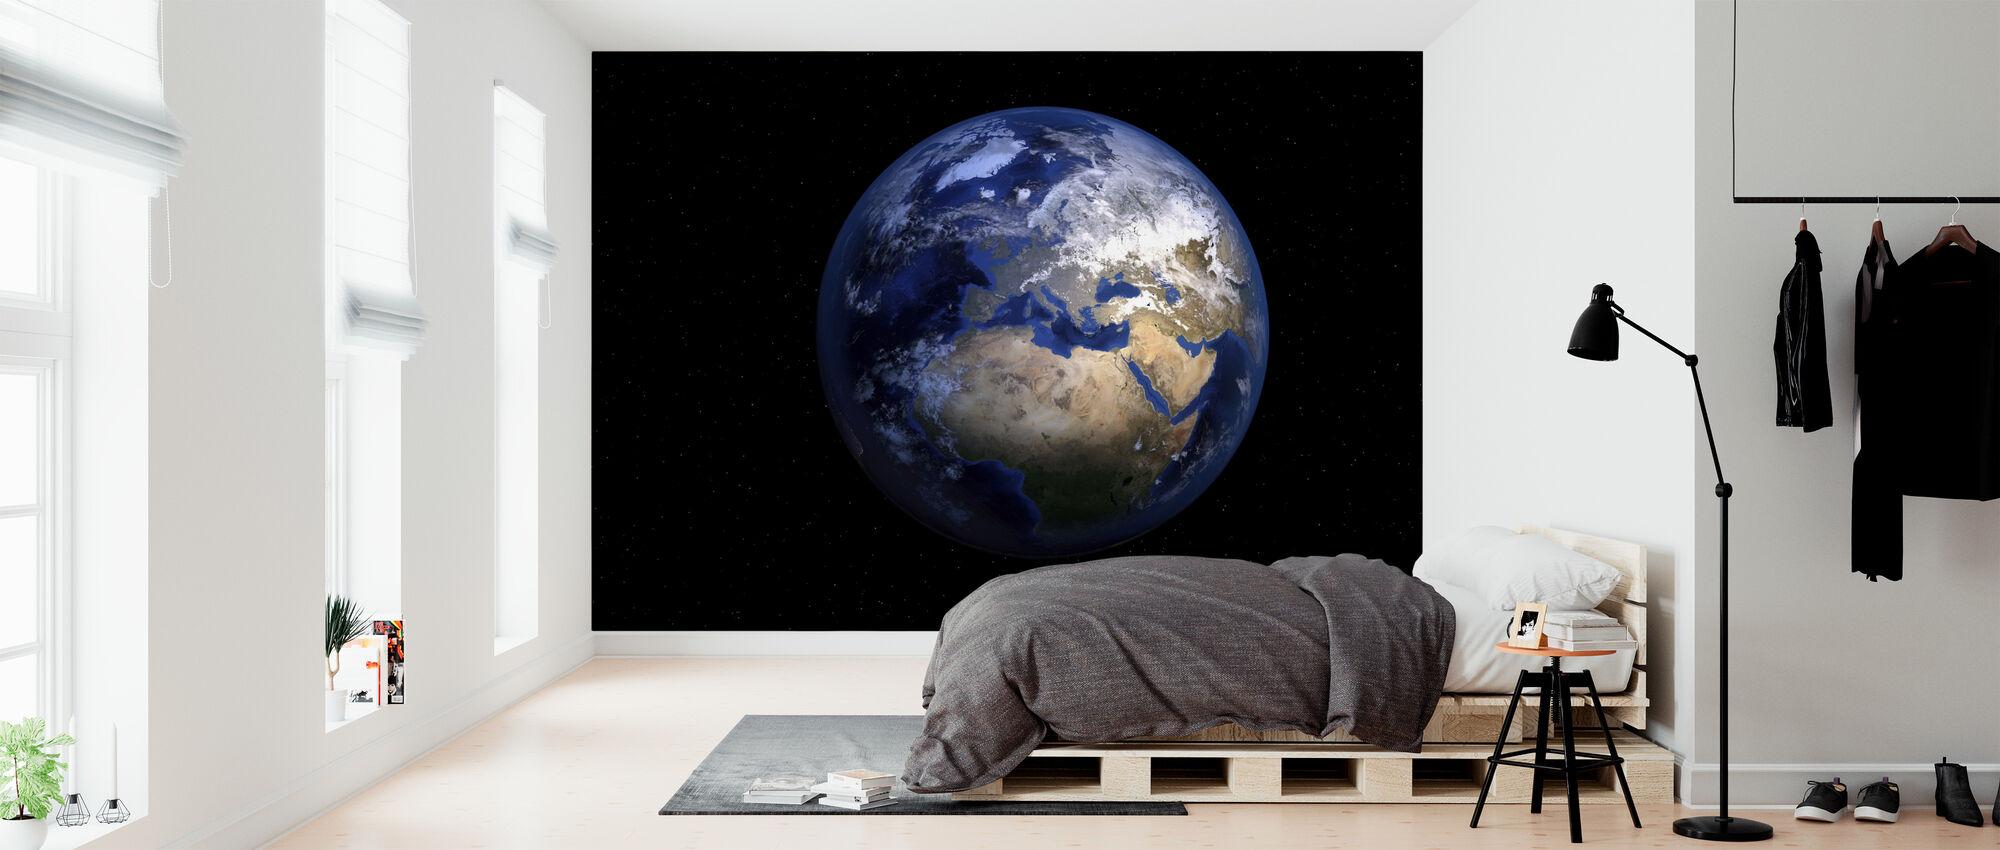 Planet Earth - Wallpaper - Bedroom